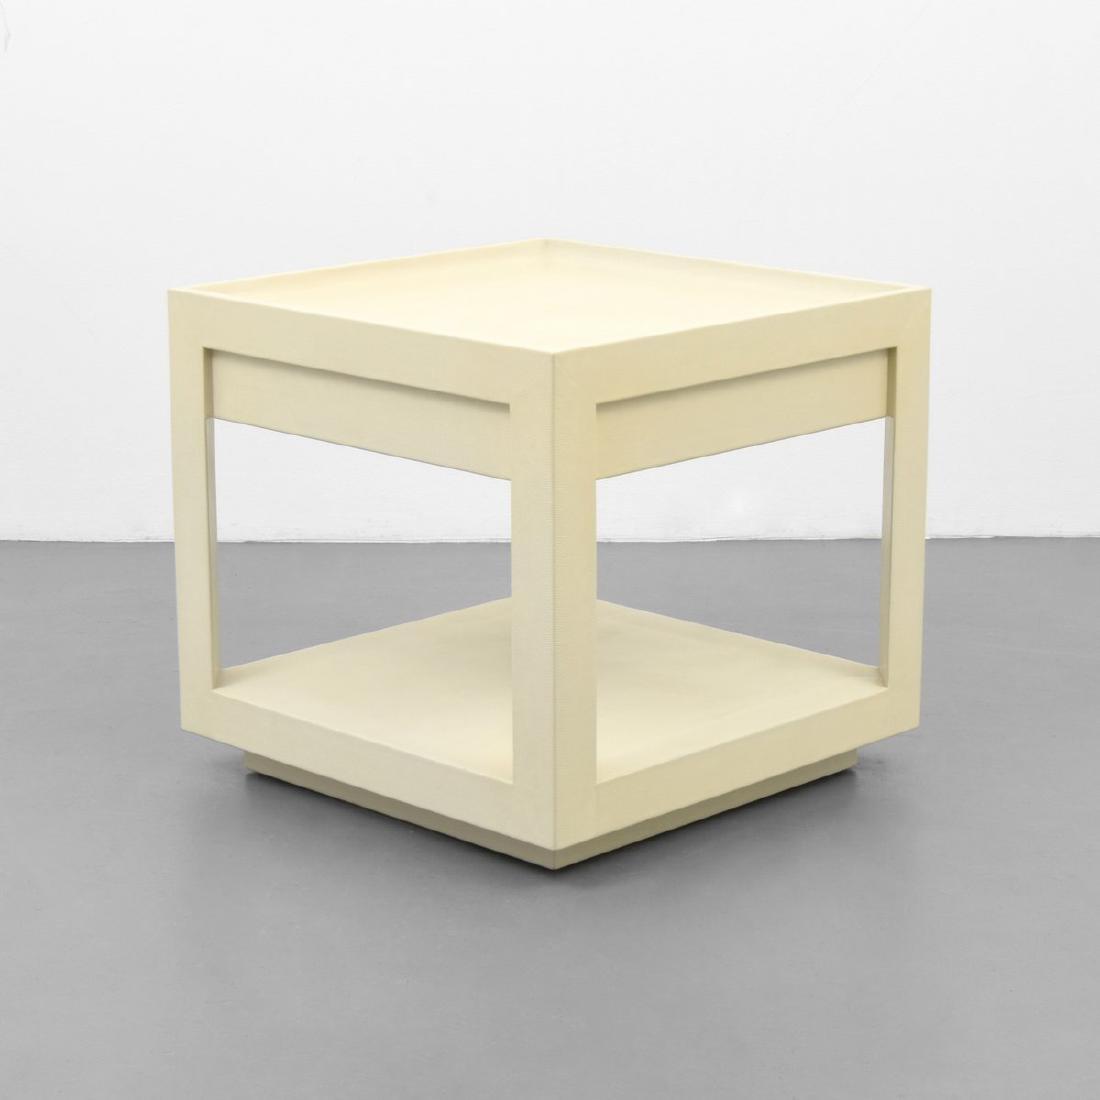 Occasional Table, Manner of Karl Springer